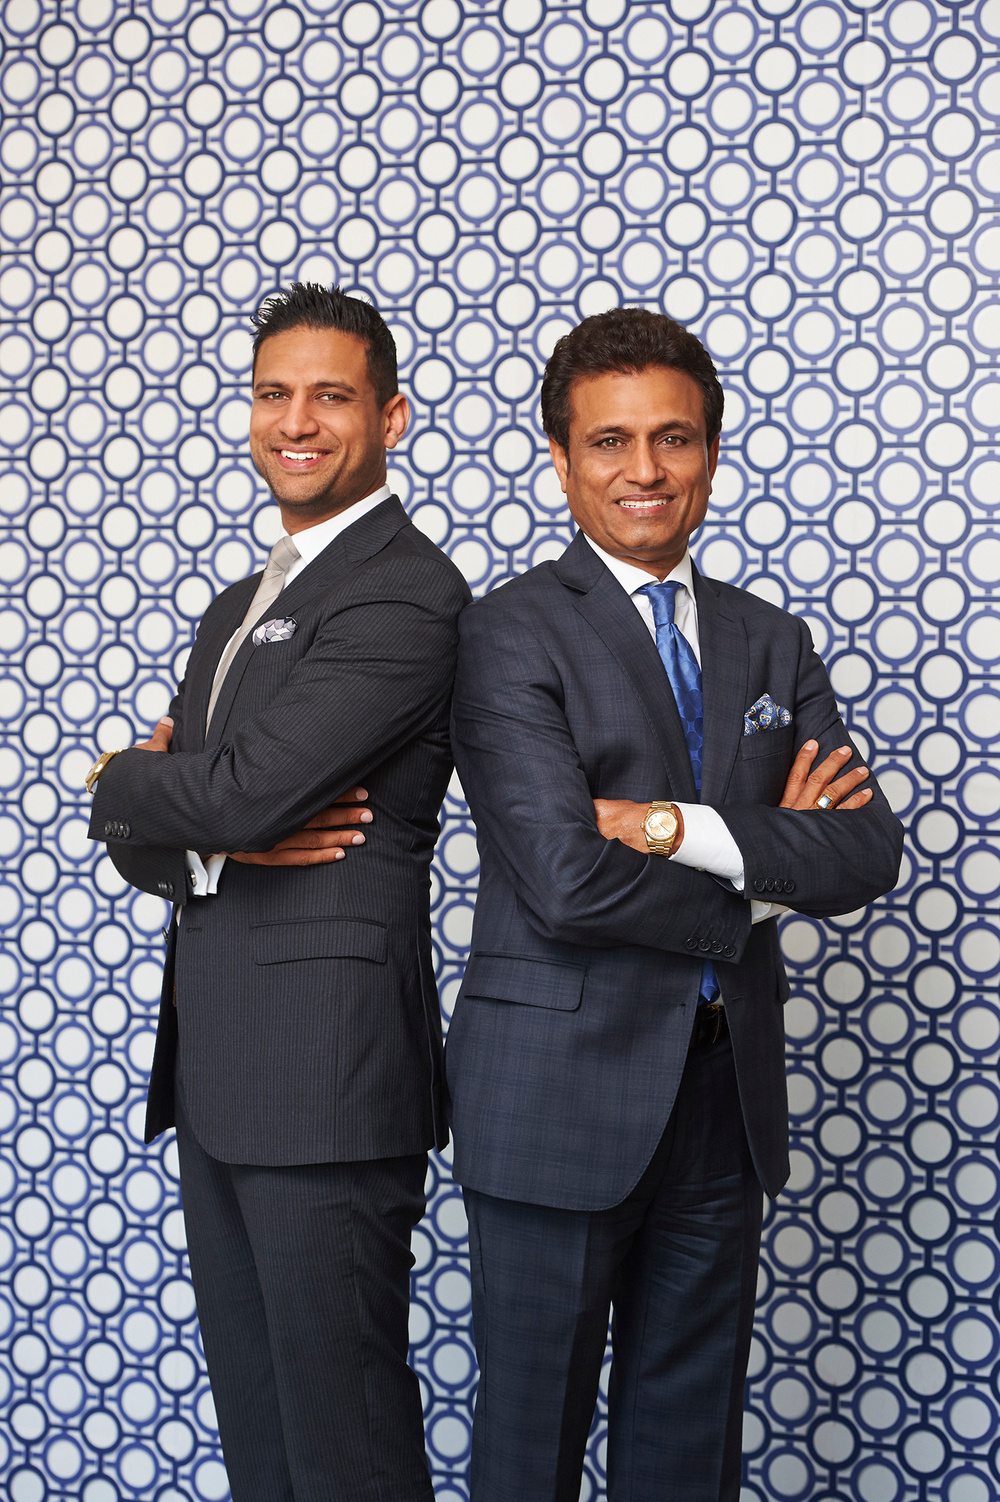 Sandeep & Ray Gupta, Sunray Group